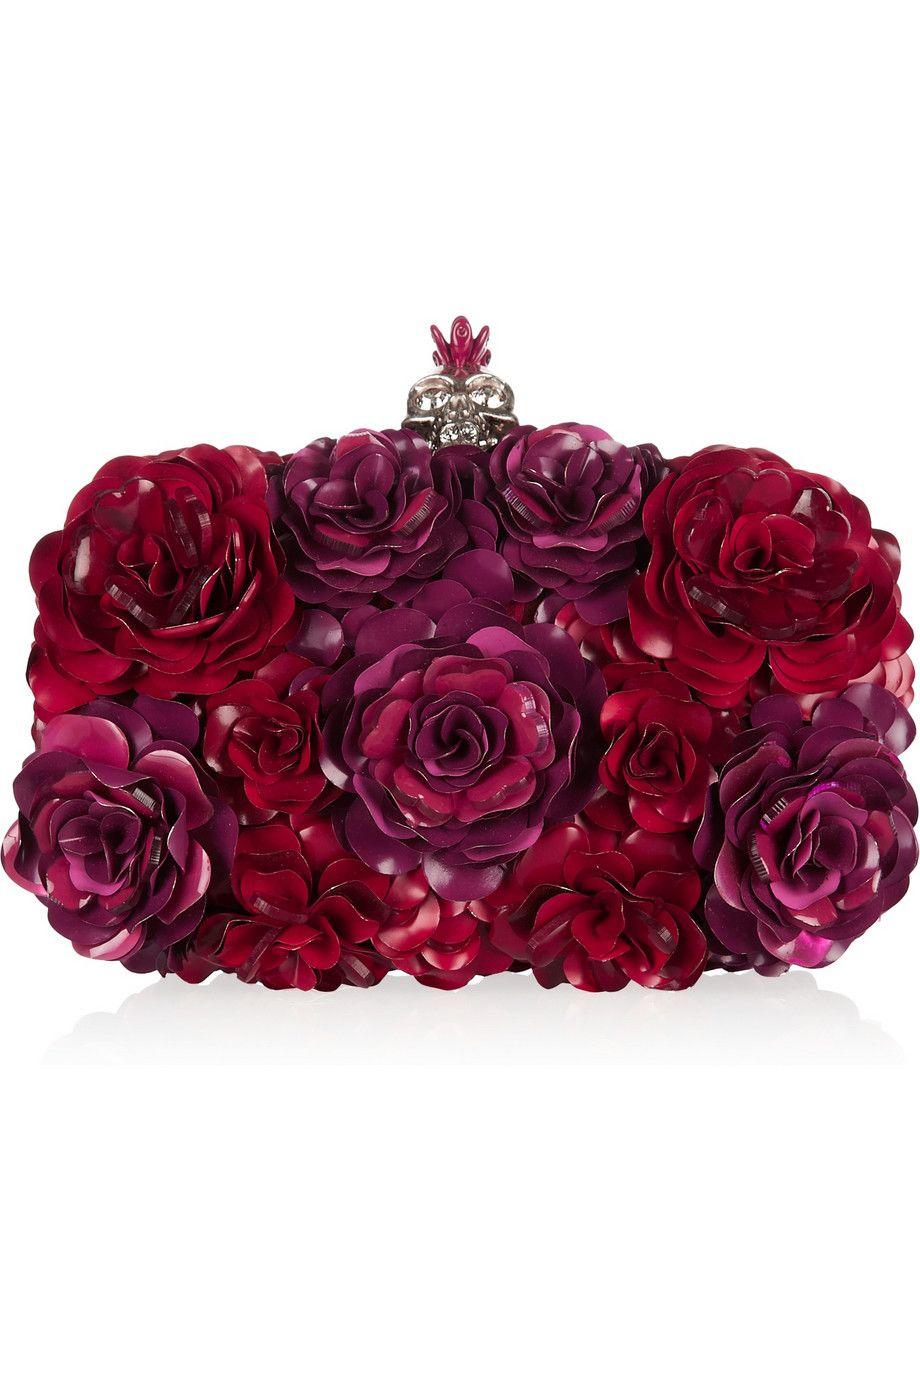 Alexander McQueen | Enameled flower box clutch